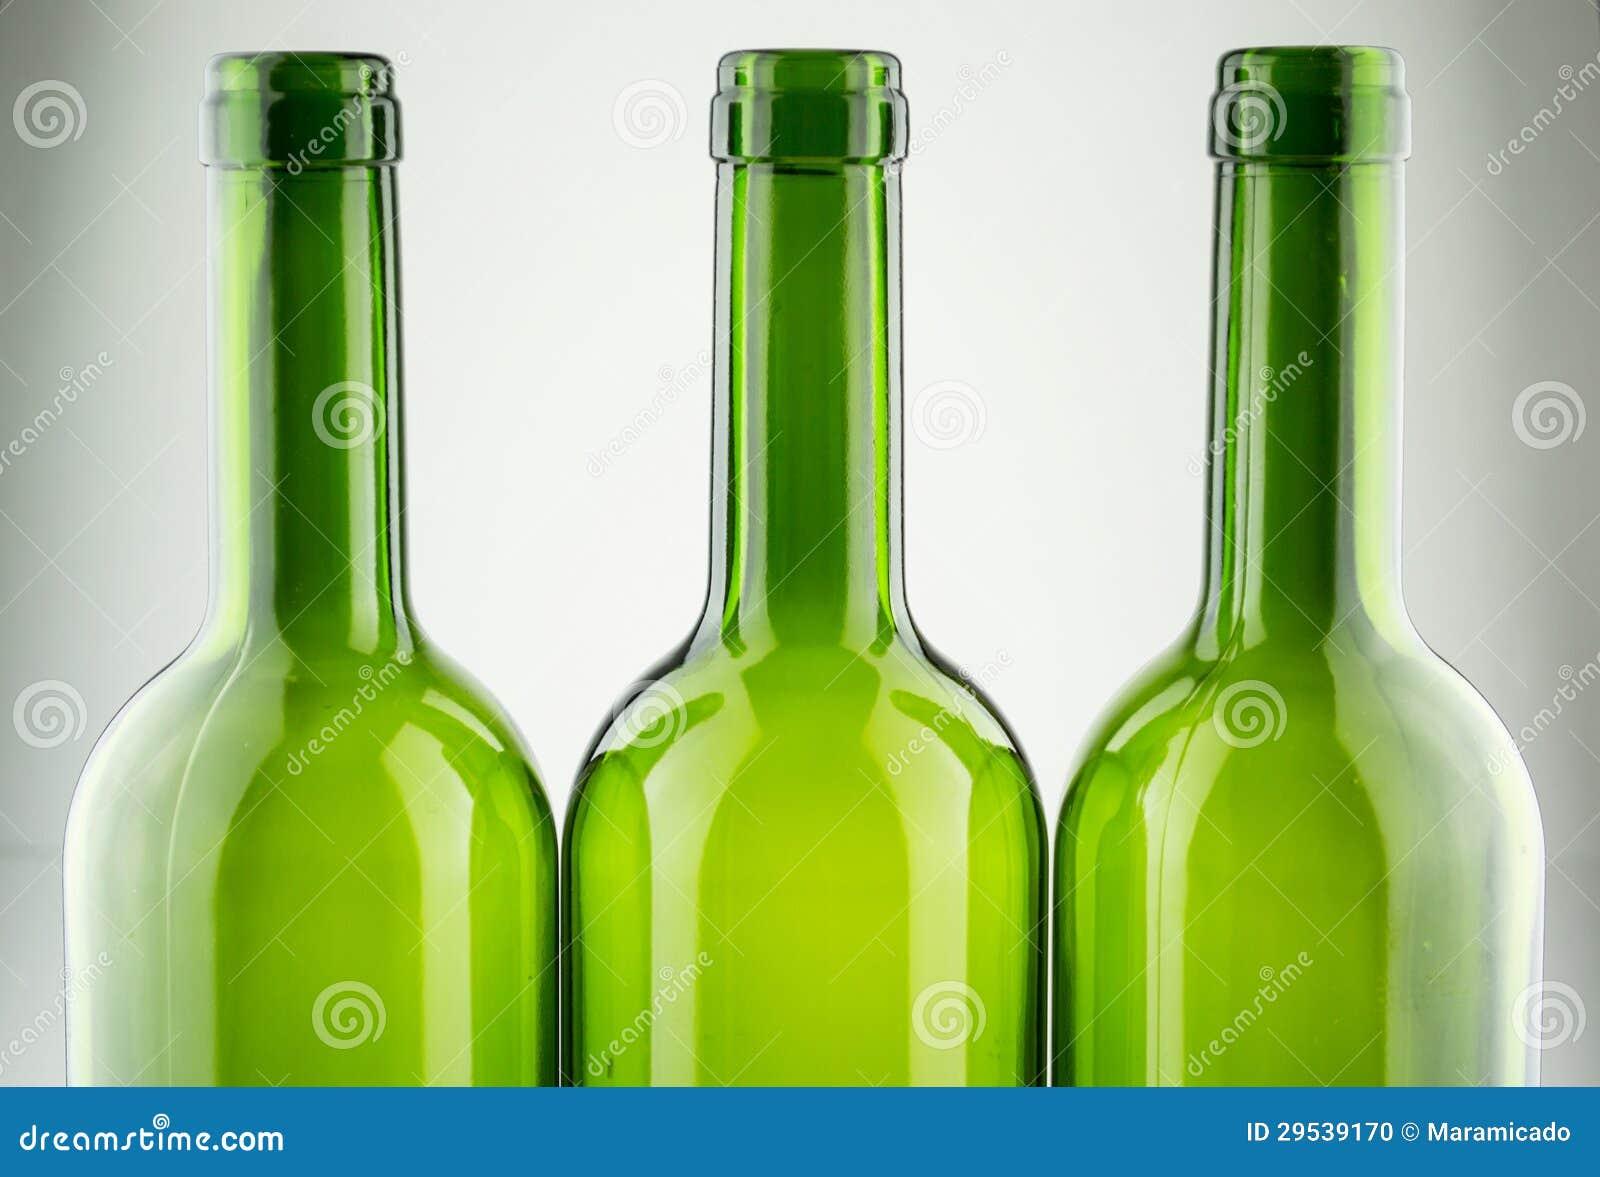 Empty green wine bottles isolated on white stock photo for Green wine bottles